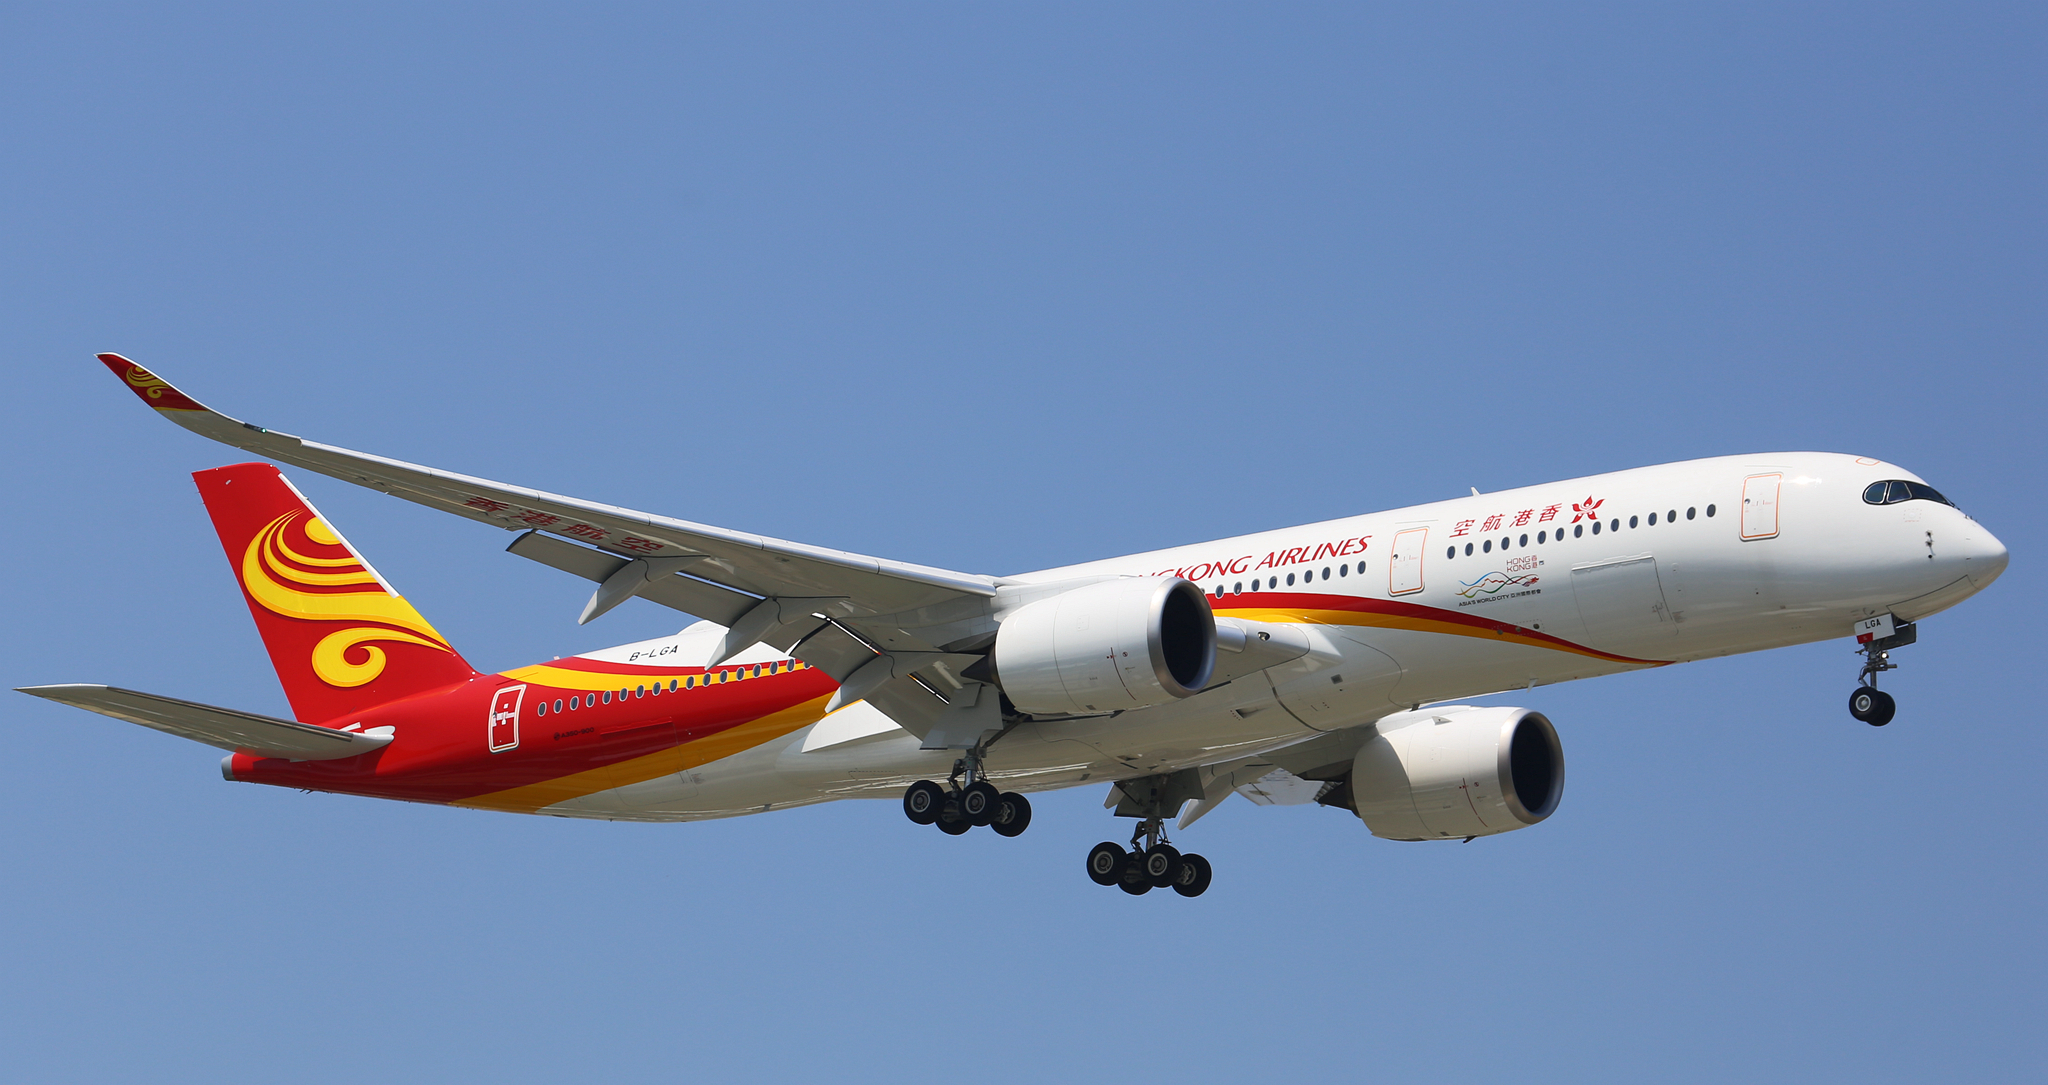 En Airbus A350-900 fra Hong Kong Airlines. Foto: 湯小沅, CC 2.0